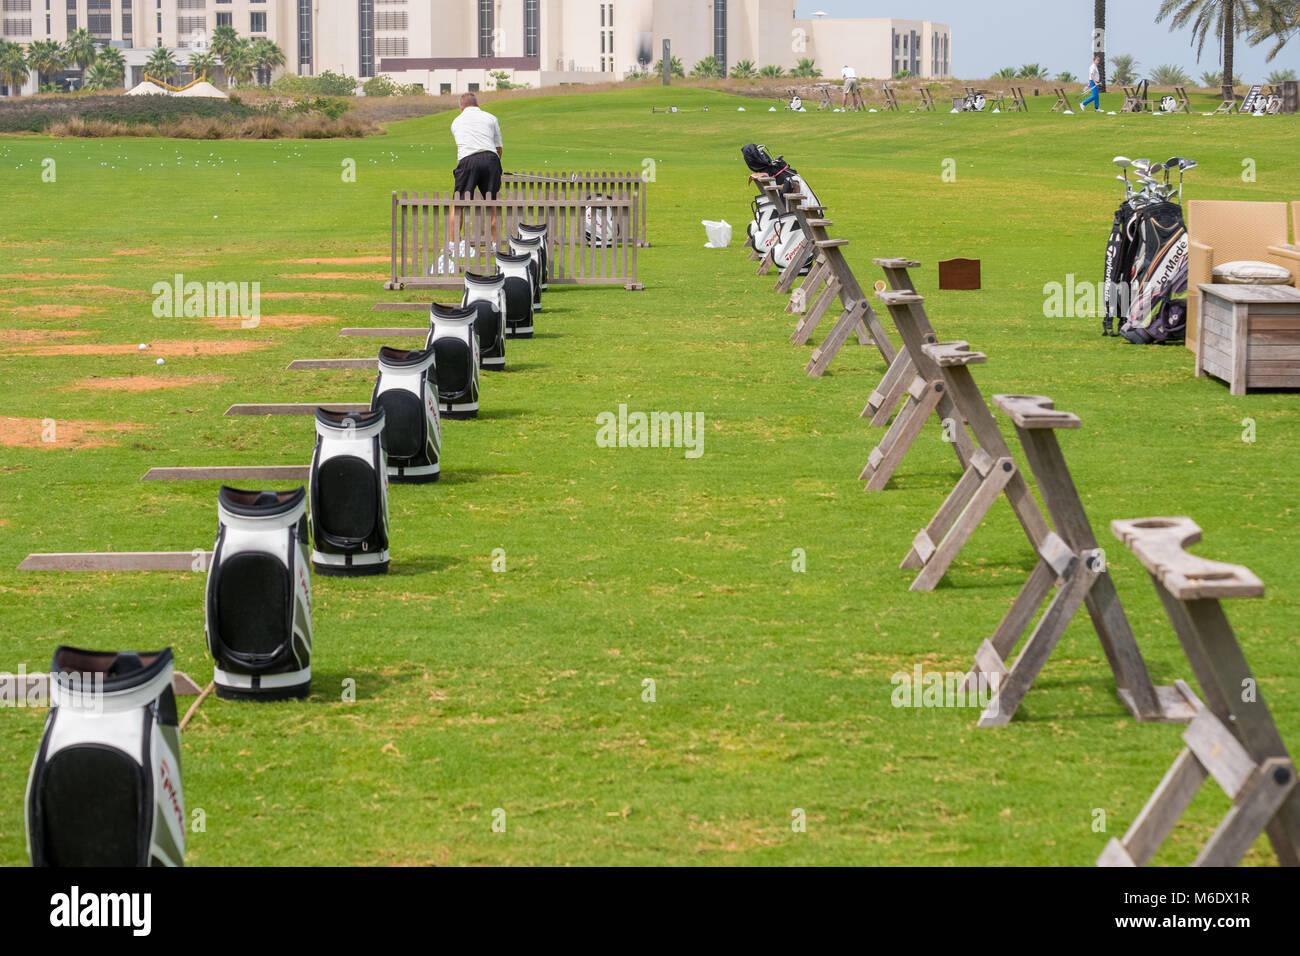 Golf Bags artistically arranged in a row at Saadiyat Beach Golf Course Abu Dhbai. - Stock Image